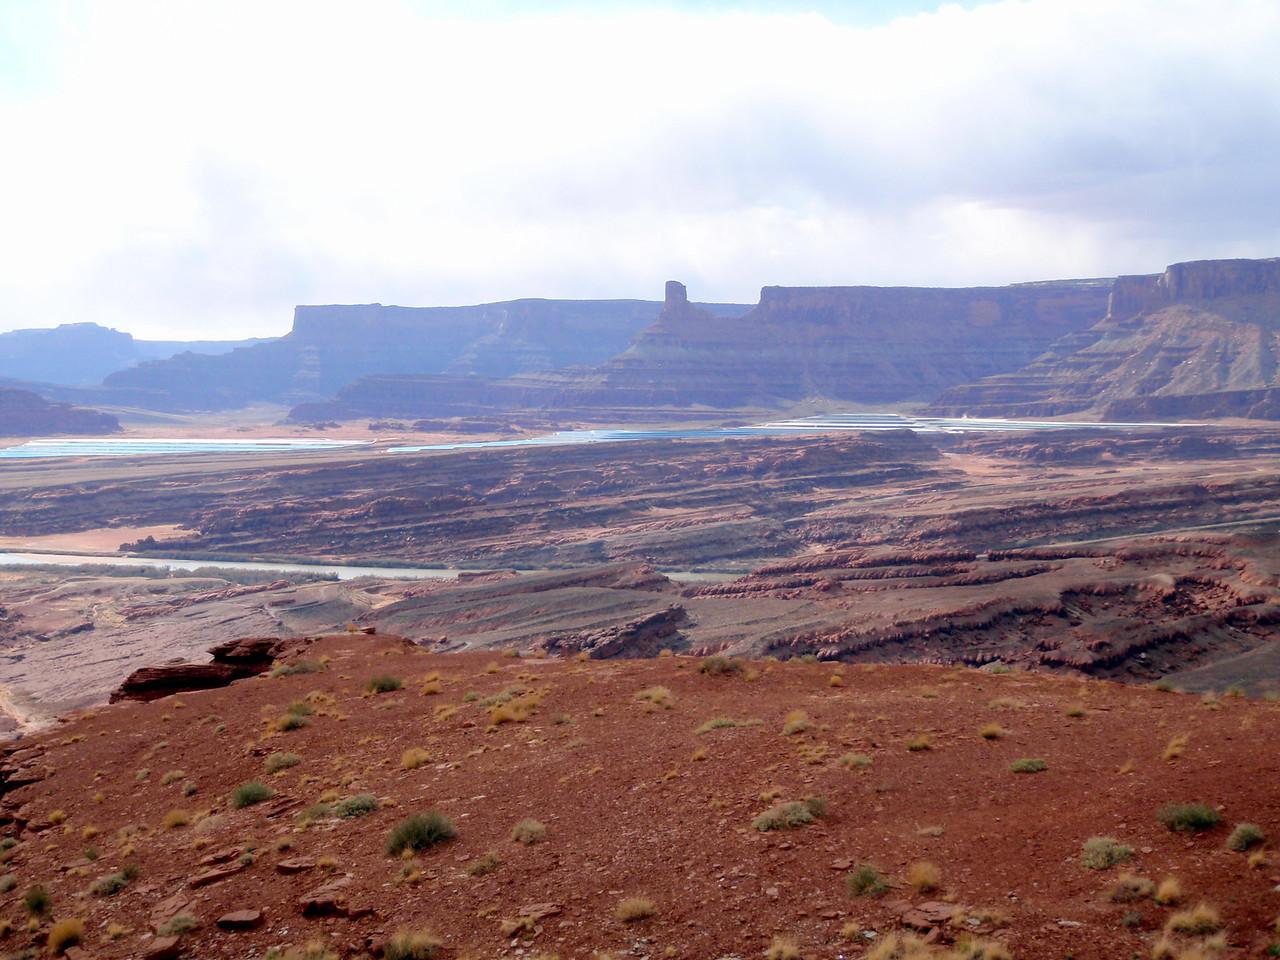 View of Potash Evaporation Ponds From Top of Hurrah Pass Near Moab, UT